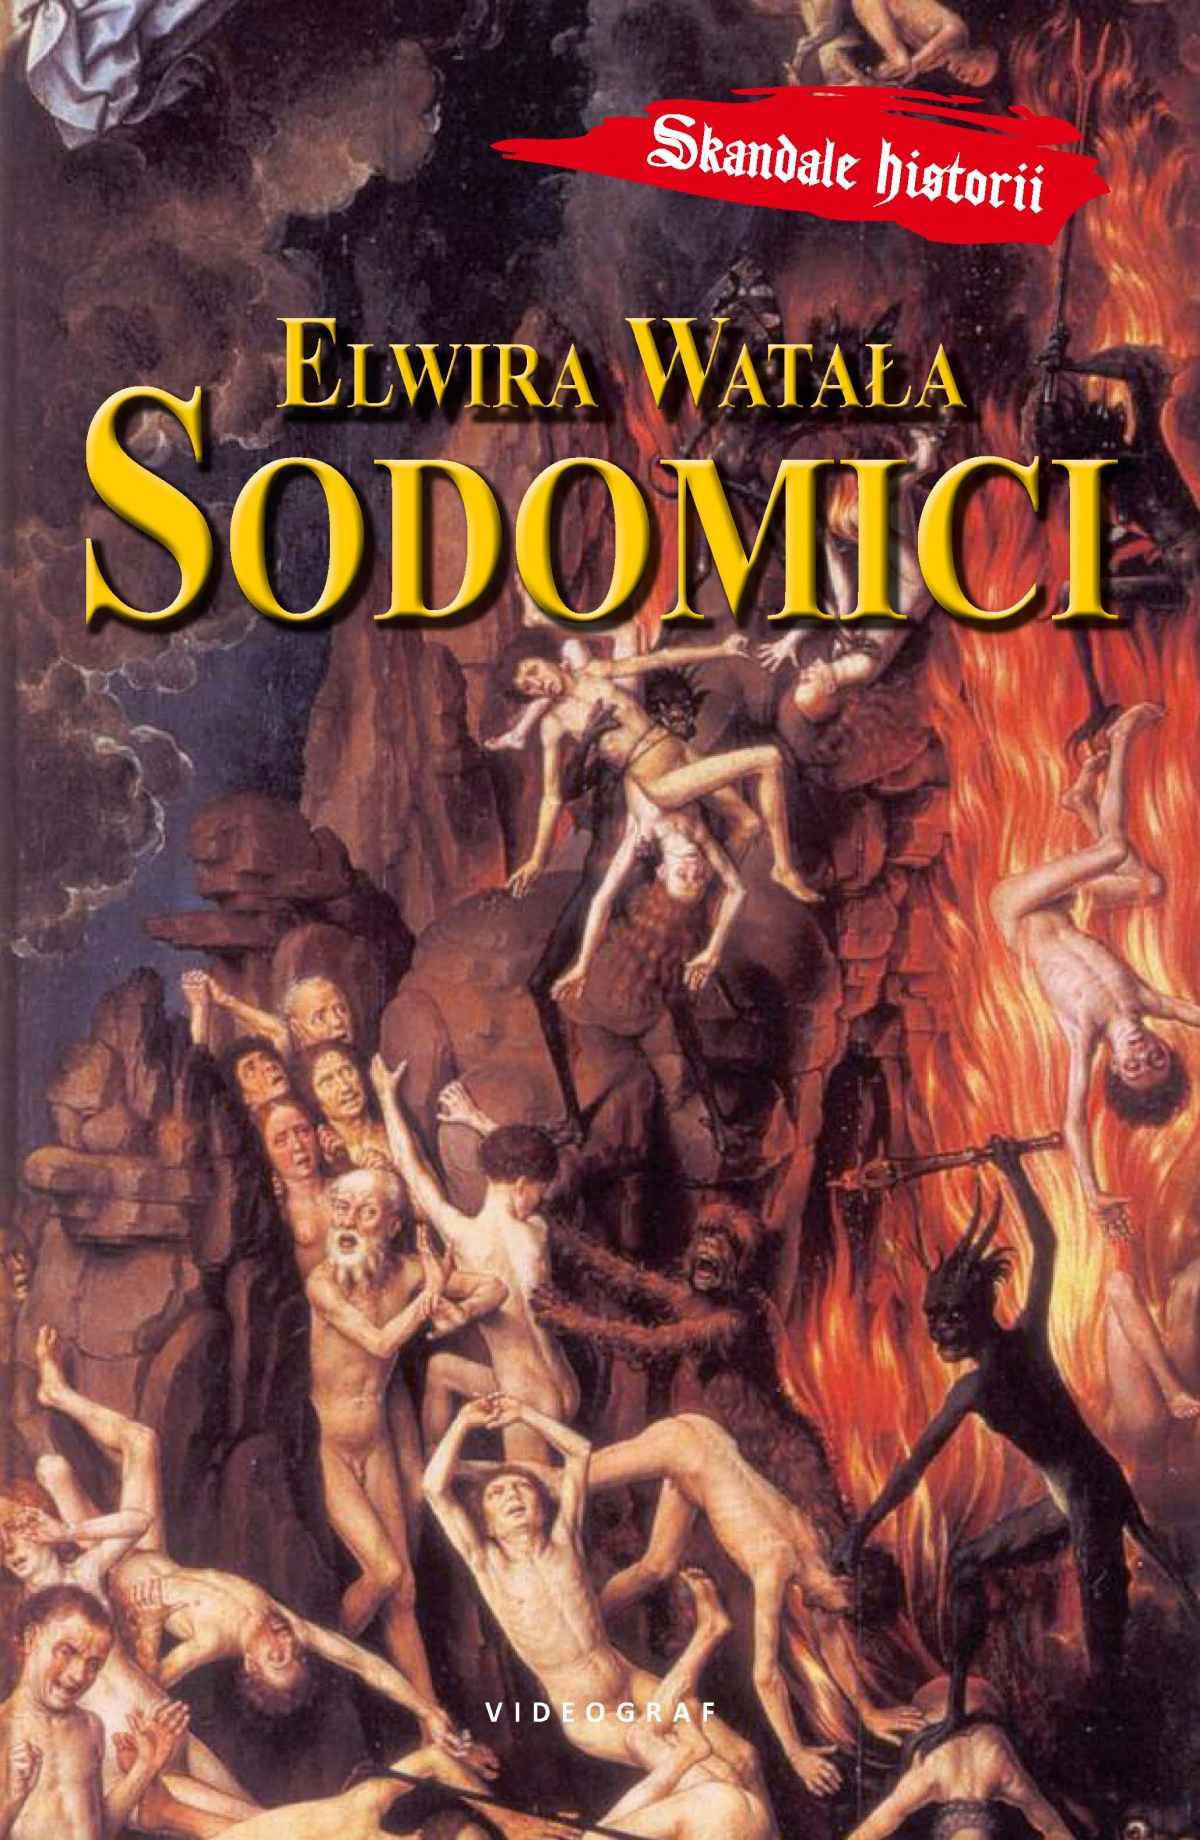 Sodomici - Ebook (Książka na Kindle) do pobrania w formacie MOBI